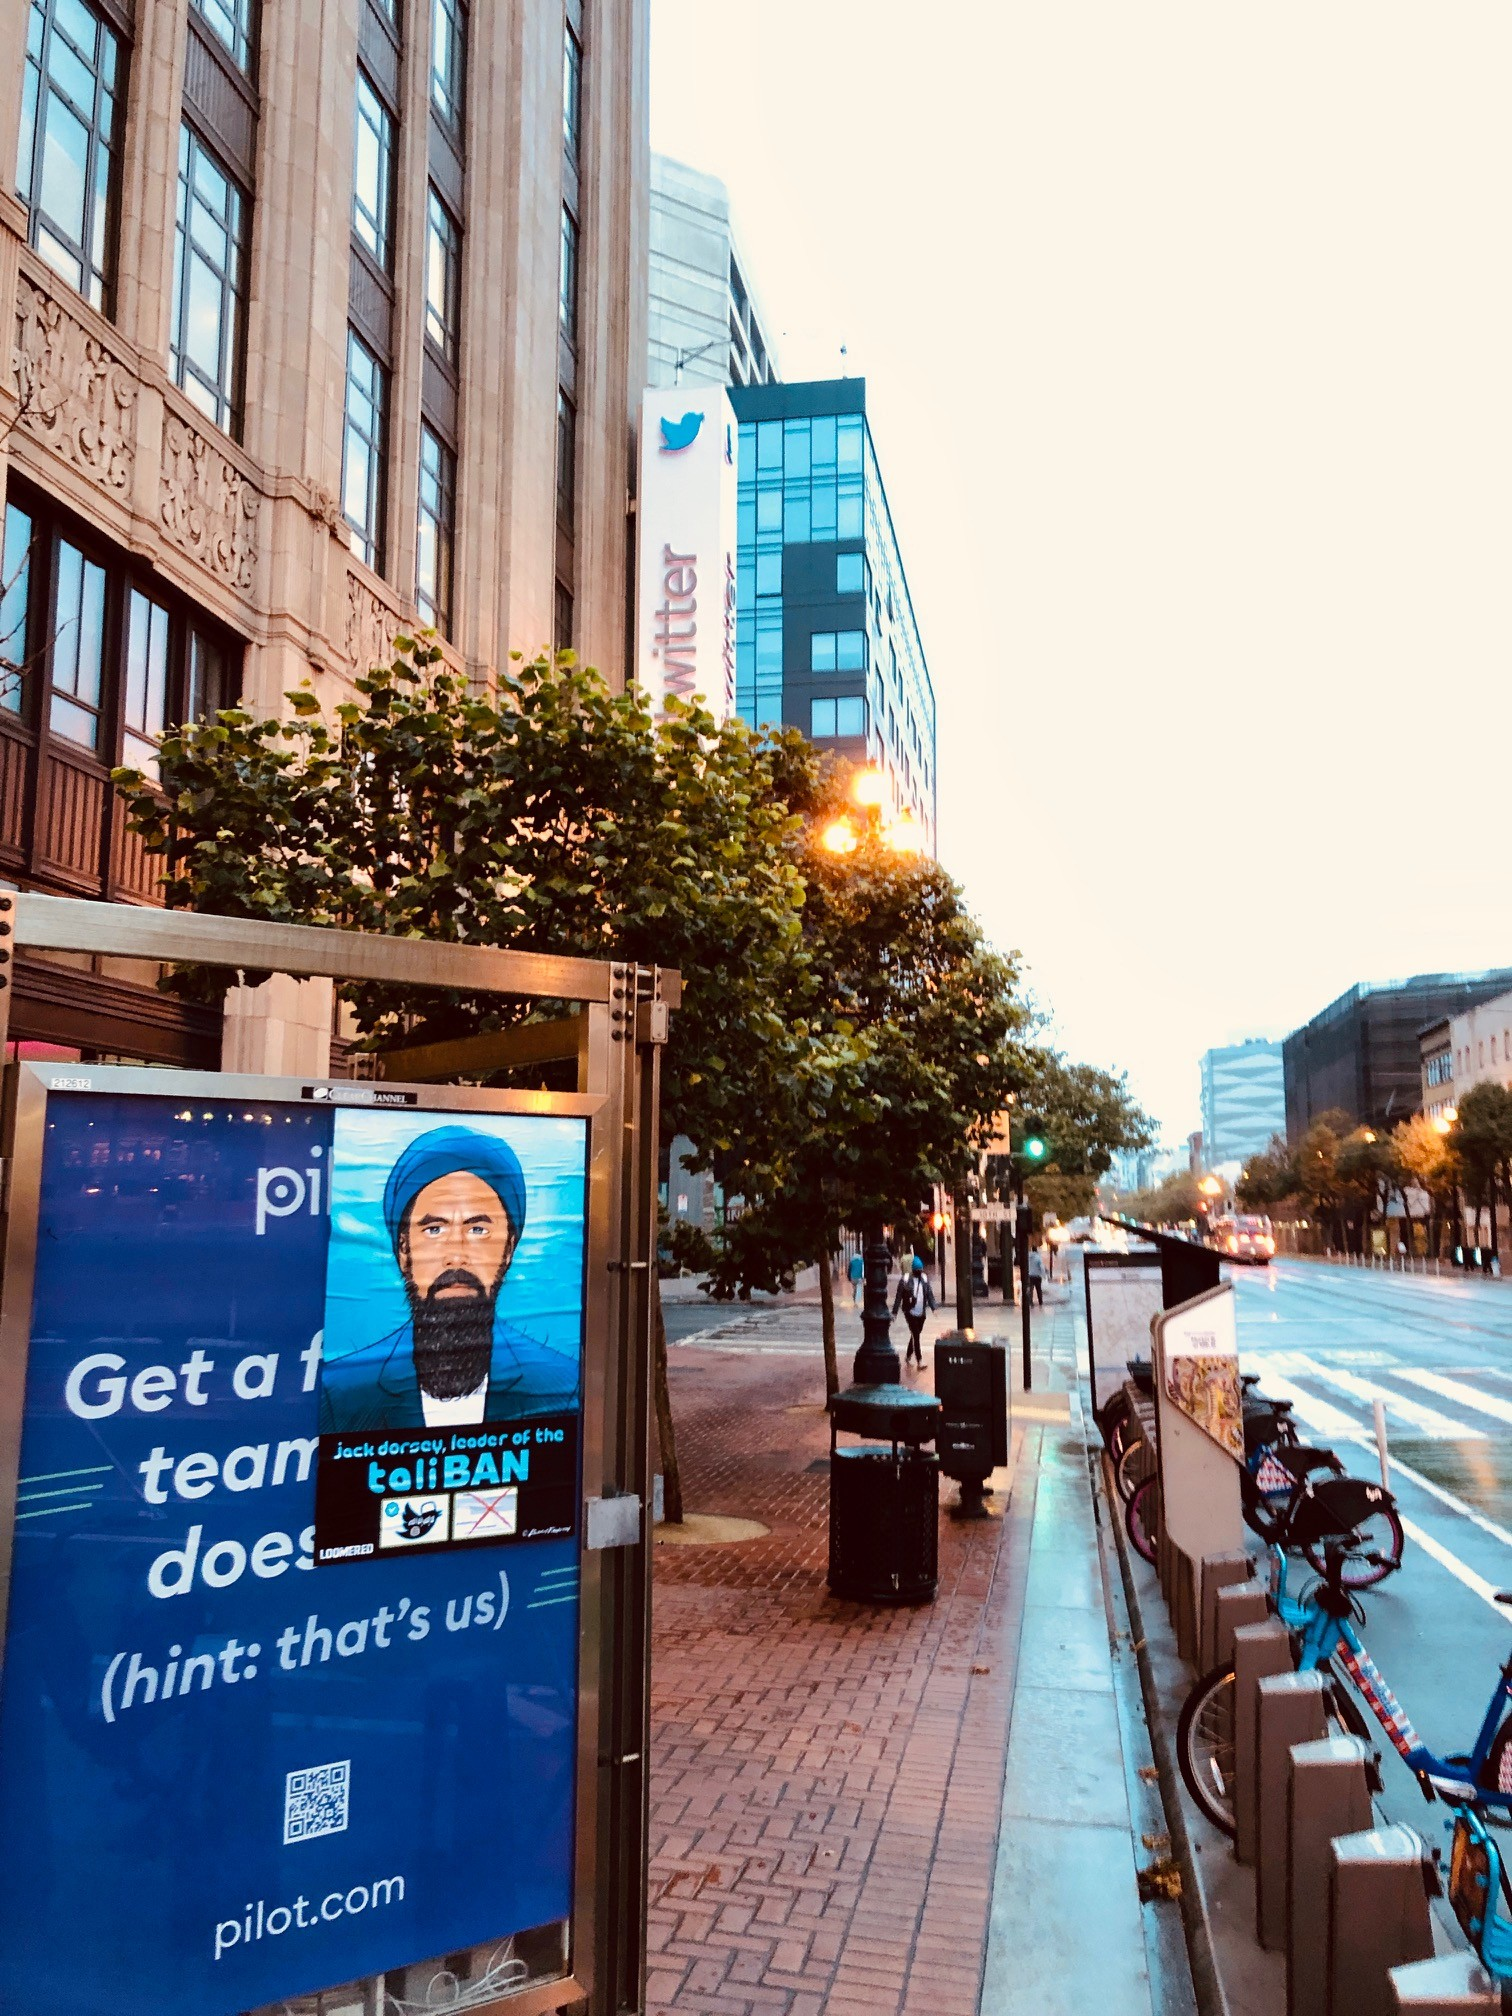 'TaliBAN:' Street Art Denouncing Twitter Censorship Covers San Francisco 5